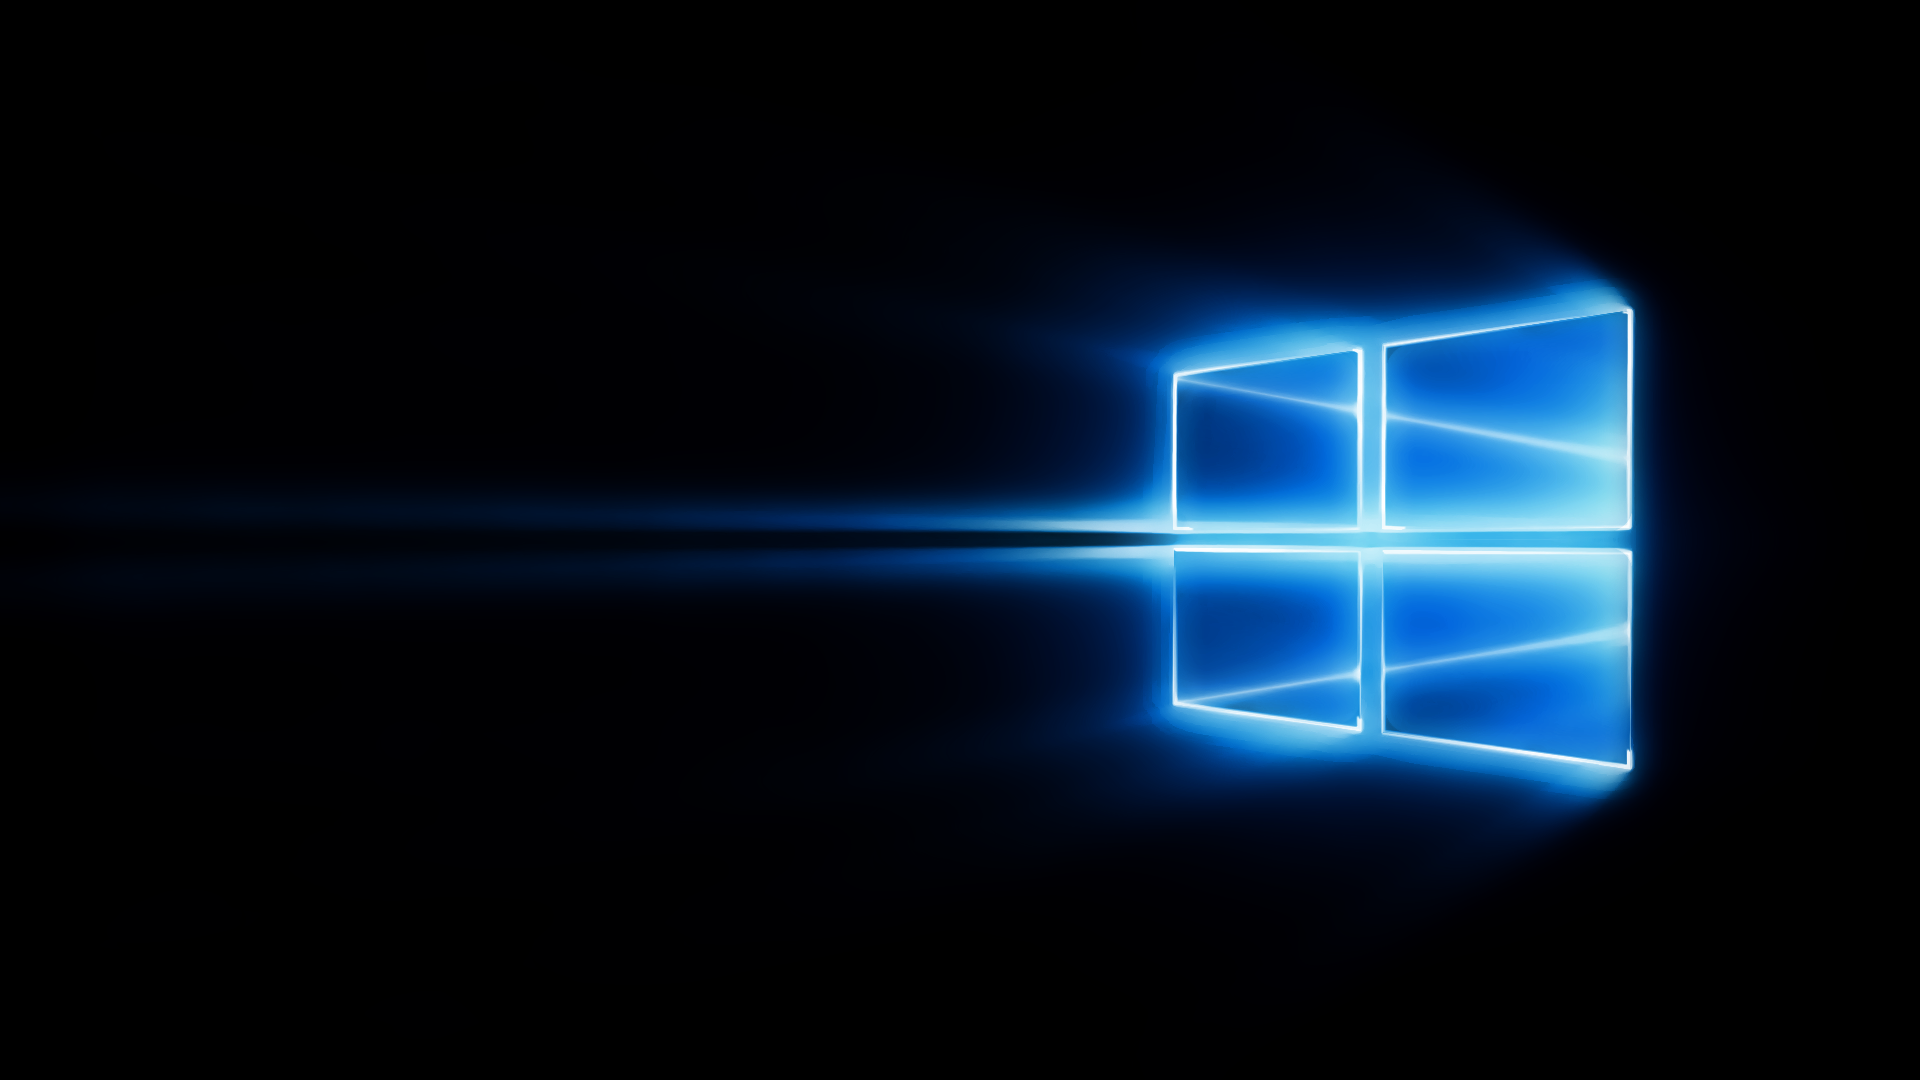 Windows 10 Wallpaper HD 2873   HD Wallpapers Site 1920x1080